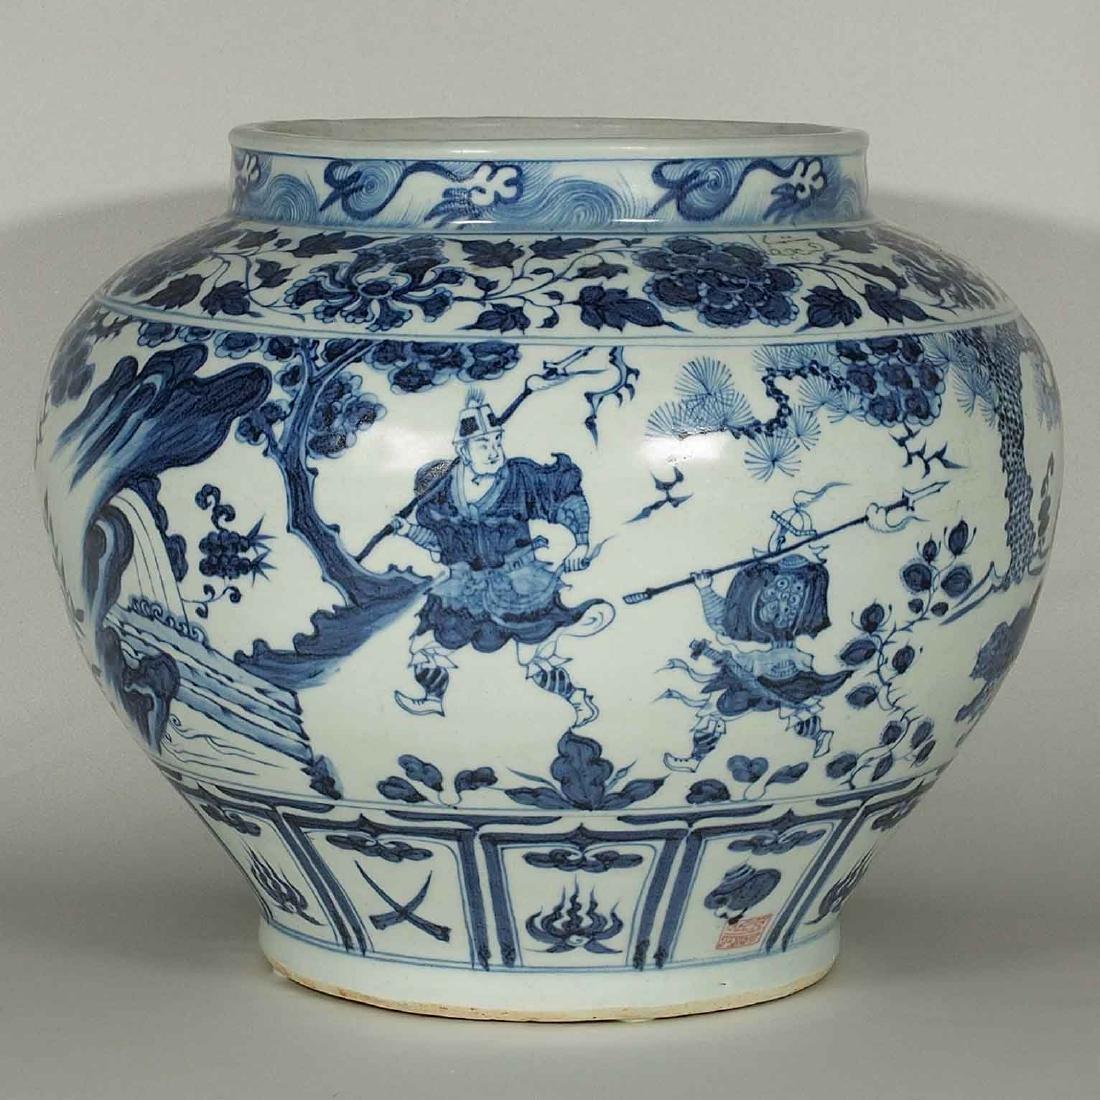 (TL) Jar with Guiguzi Scenes Design, Yuan Dynasty + TL